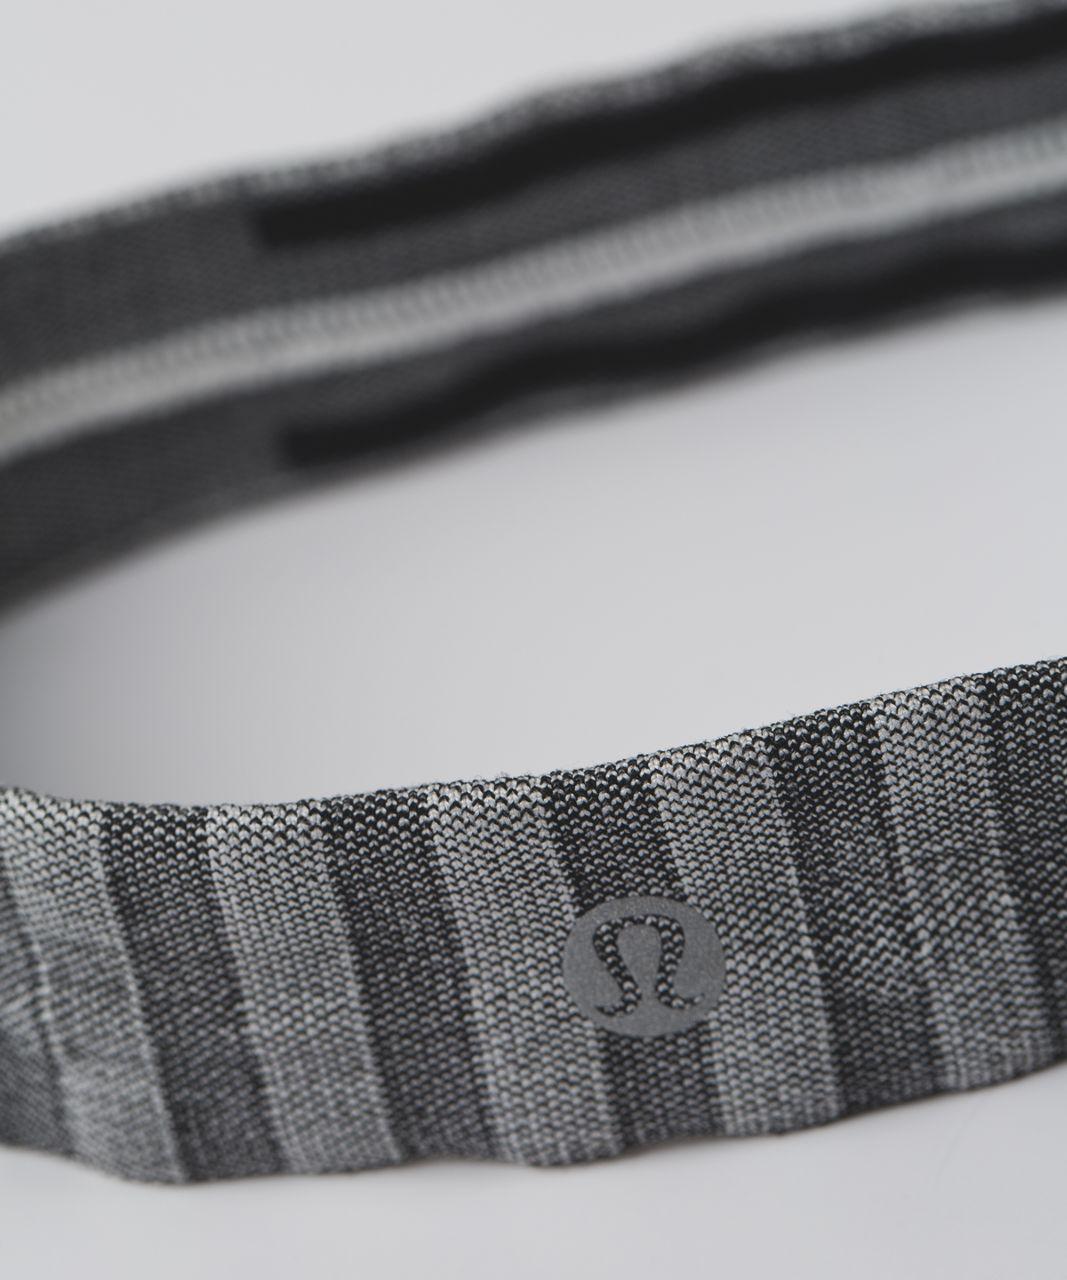 Lululemon Cardio Cross Trainer Headband - Black / Silver Spoon